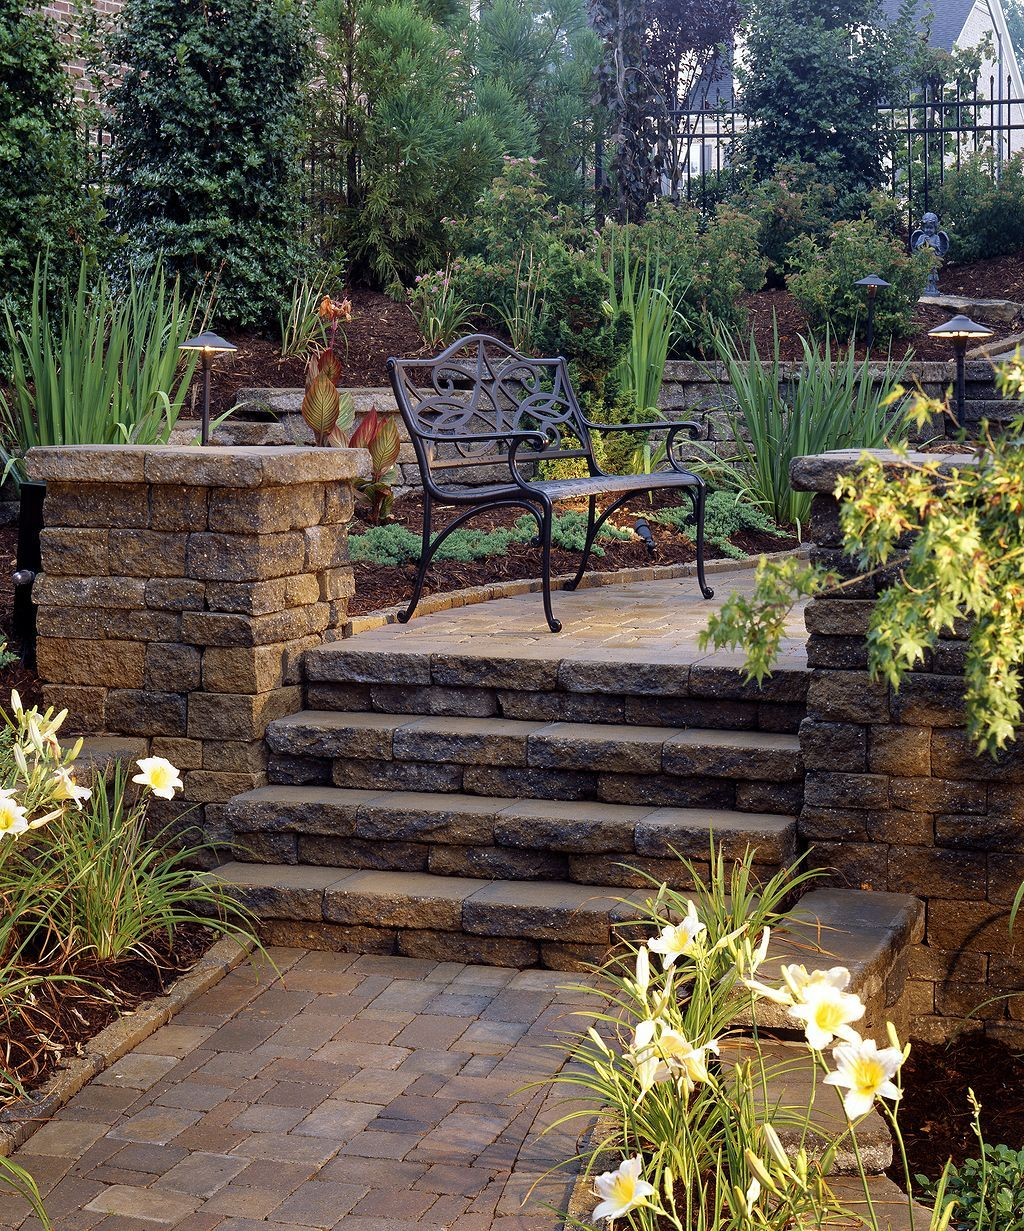 37 Cool Paver Patio Pattern Ideas For Your Garden Garden